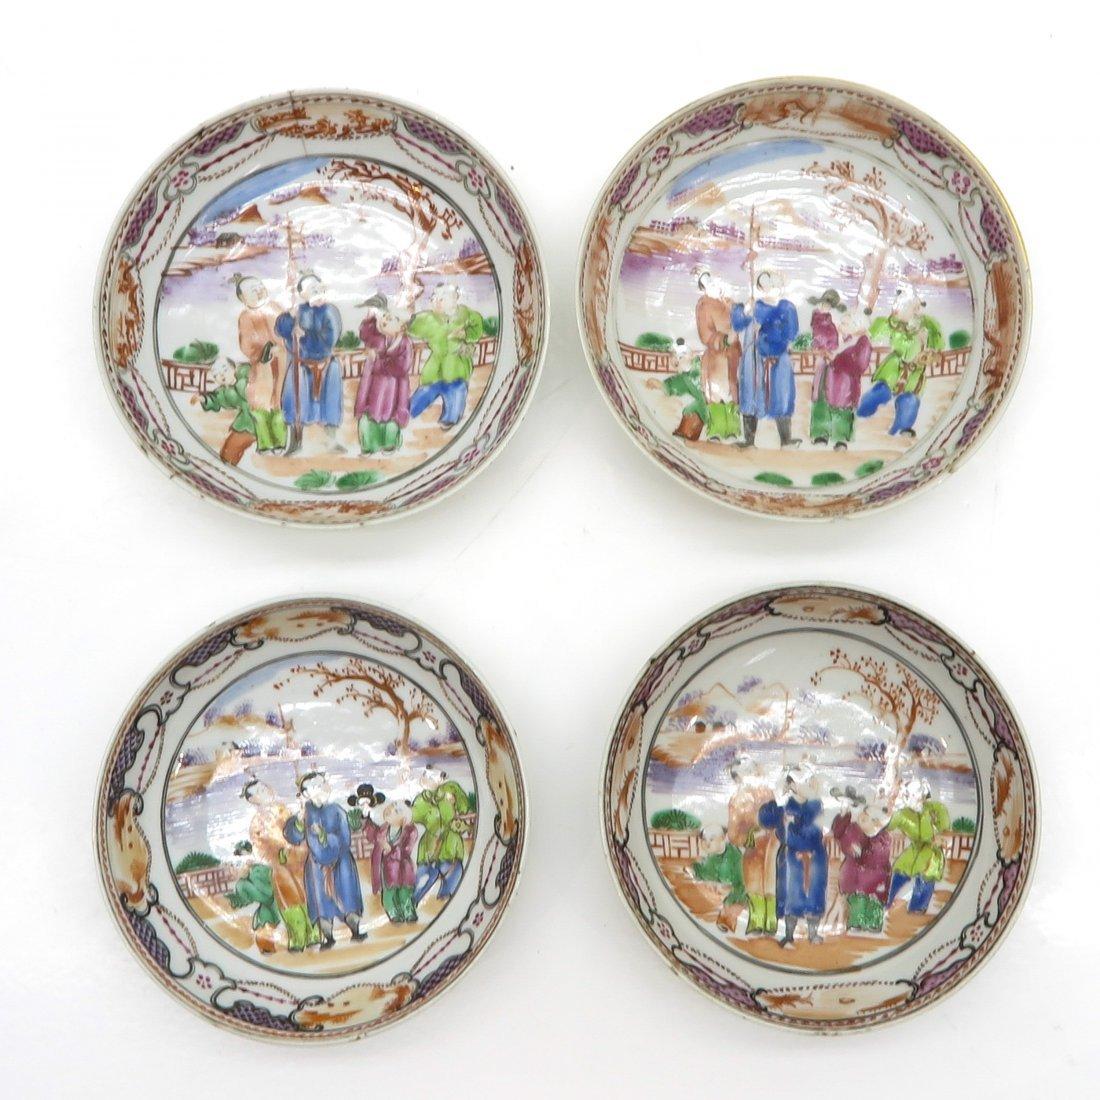 Lot of 18th Century Mandarin Decor Plates